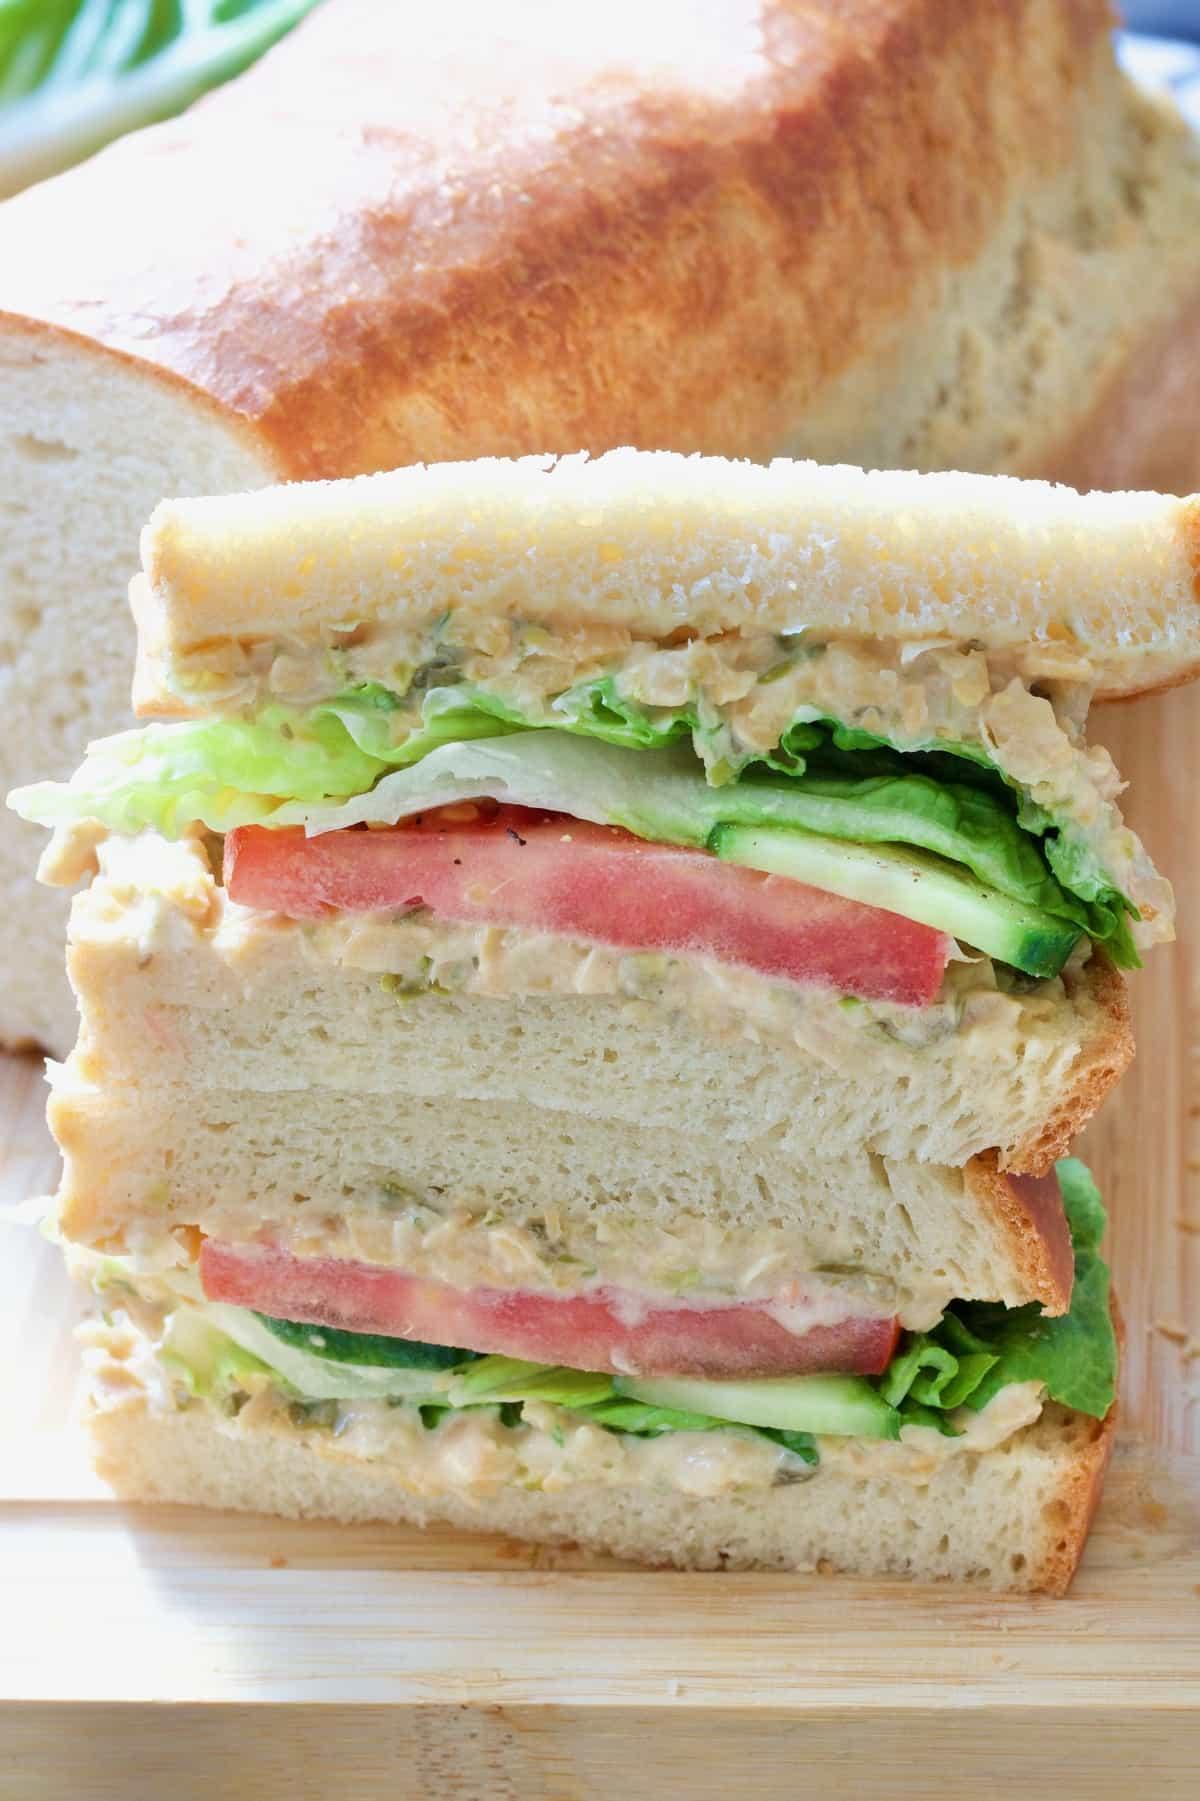 White bread sandwich halves piled up.